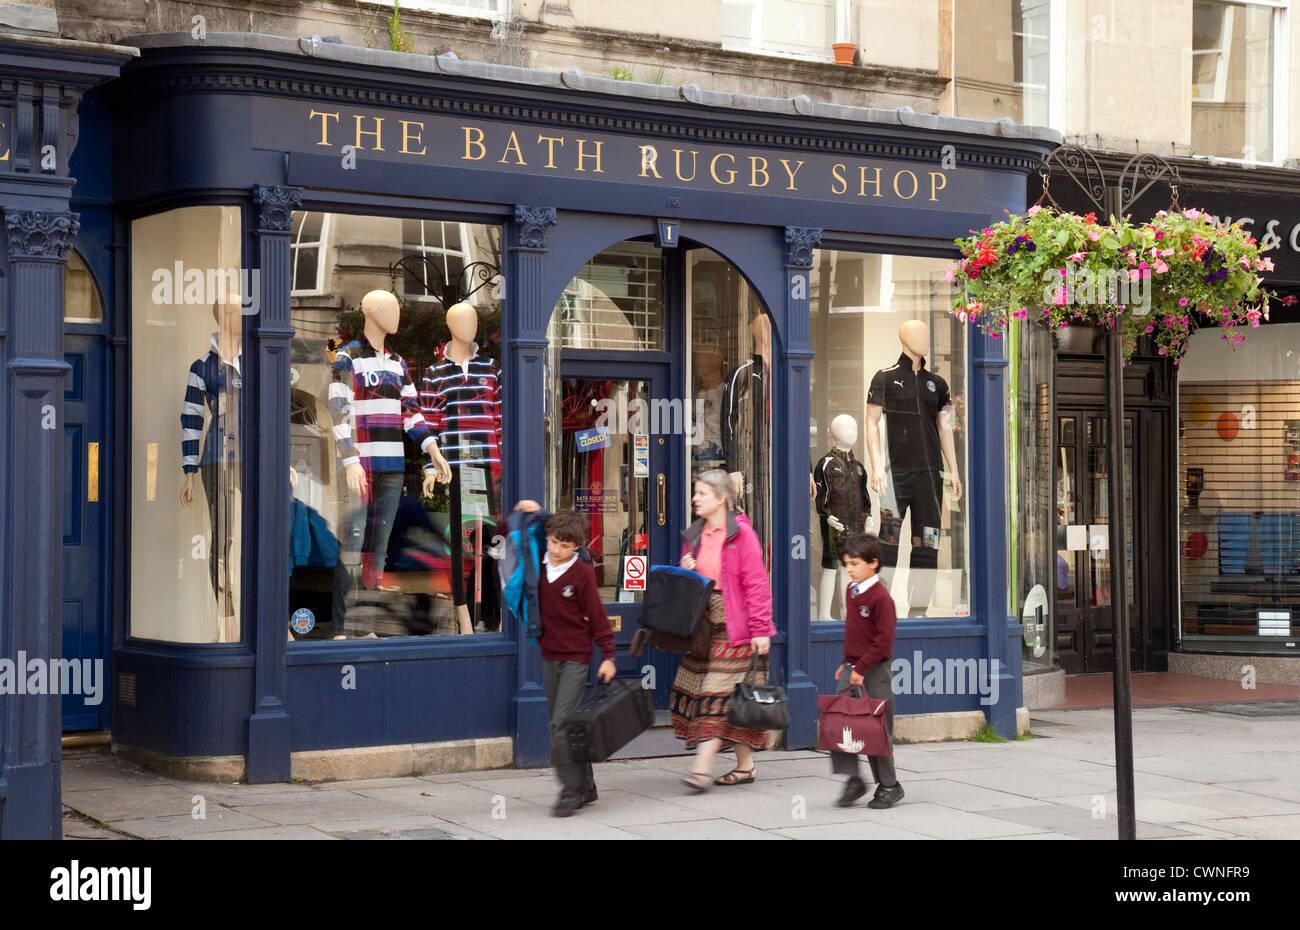 The Bath Rugby Shop, Bath Somerset UK Stock Photo: 50260541 - Alamy